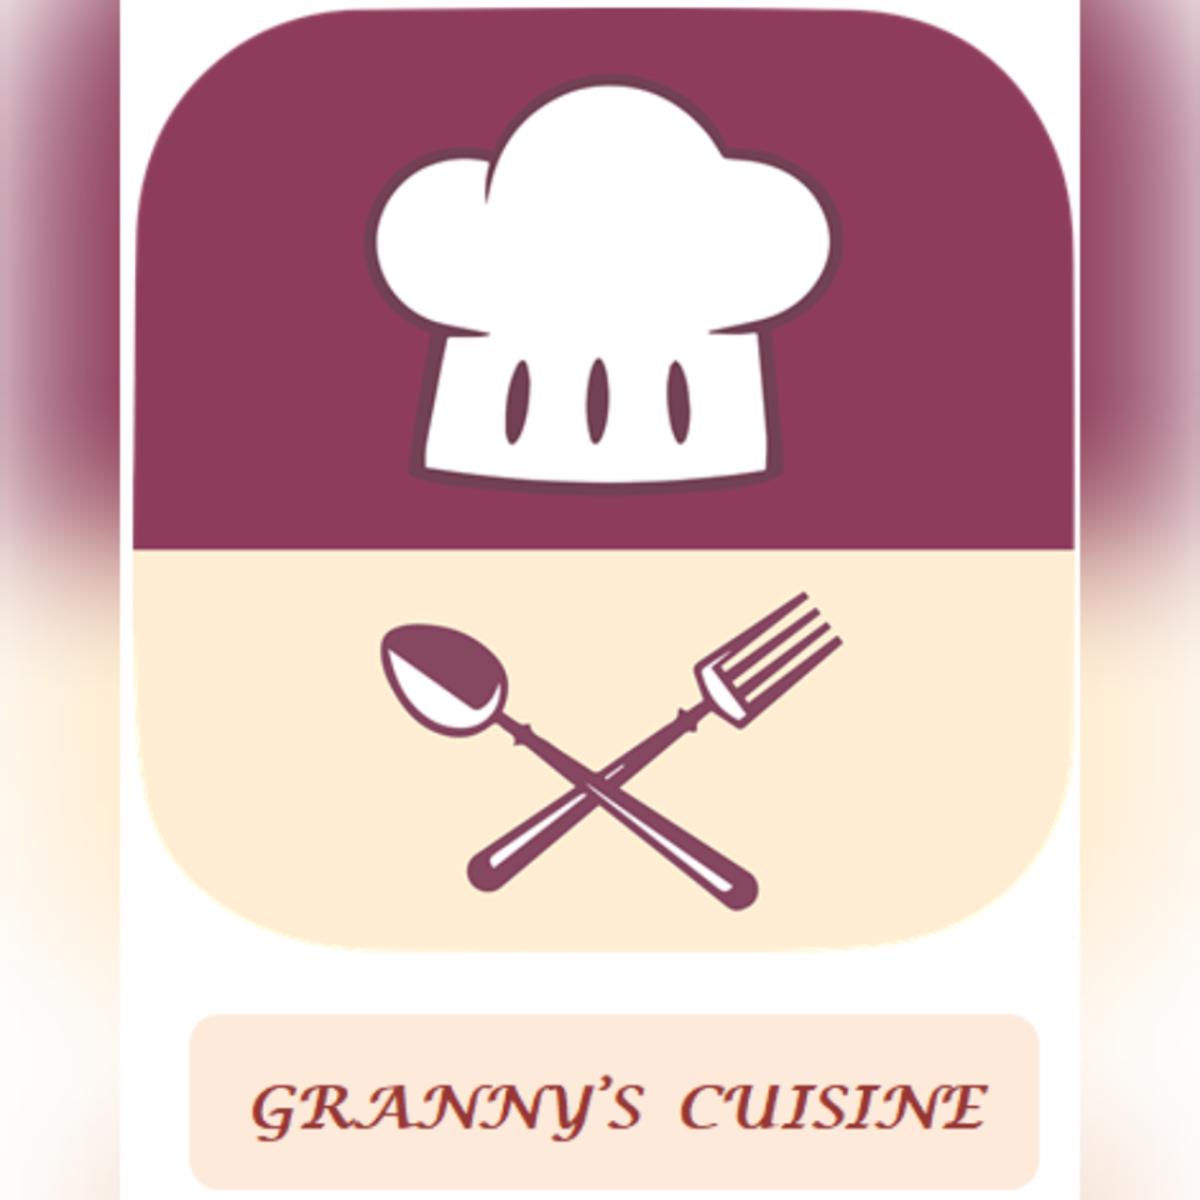 Granny's Cuisine logo.